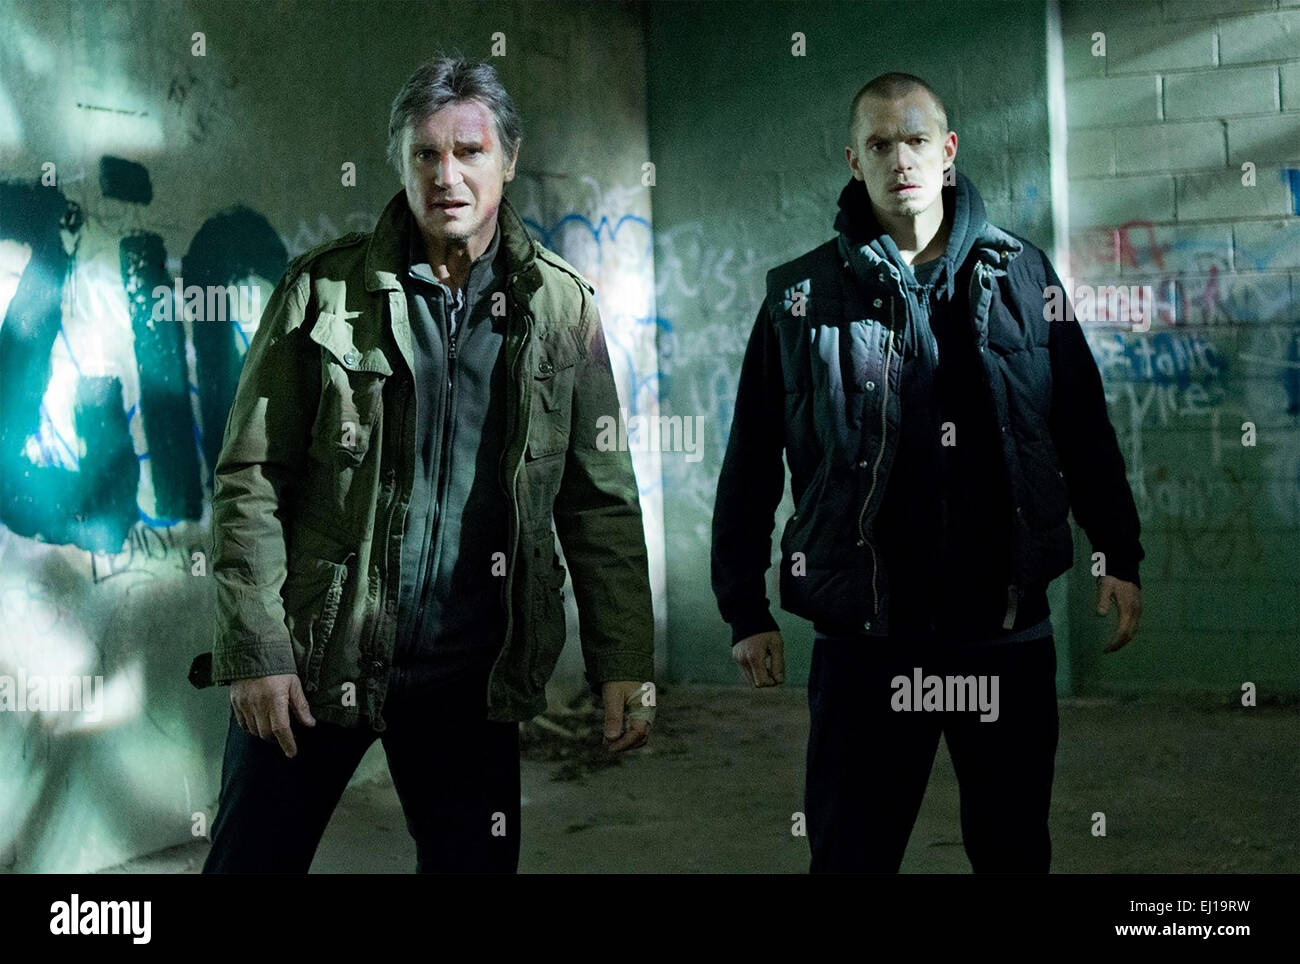 RUN ALL NIGHT  2015 Warner Bros film with Liam Neeson at left and Joel Kinnaman - Stock Image